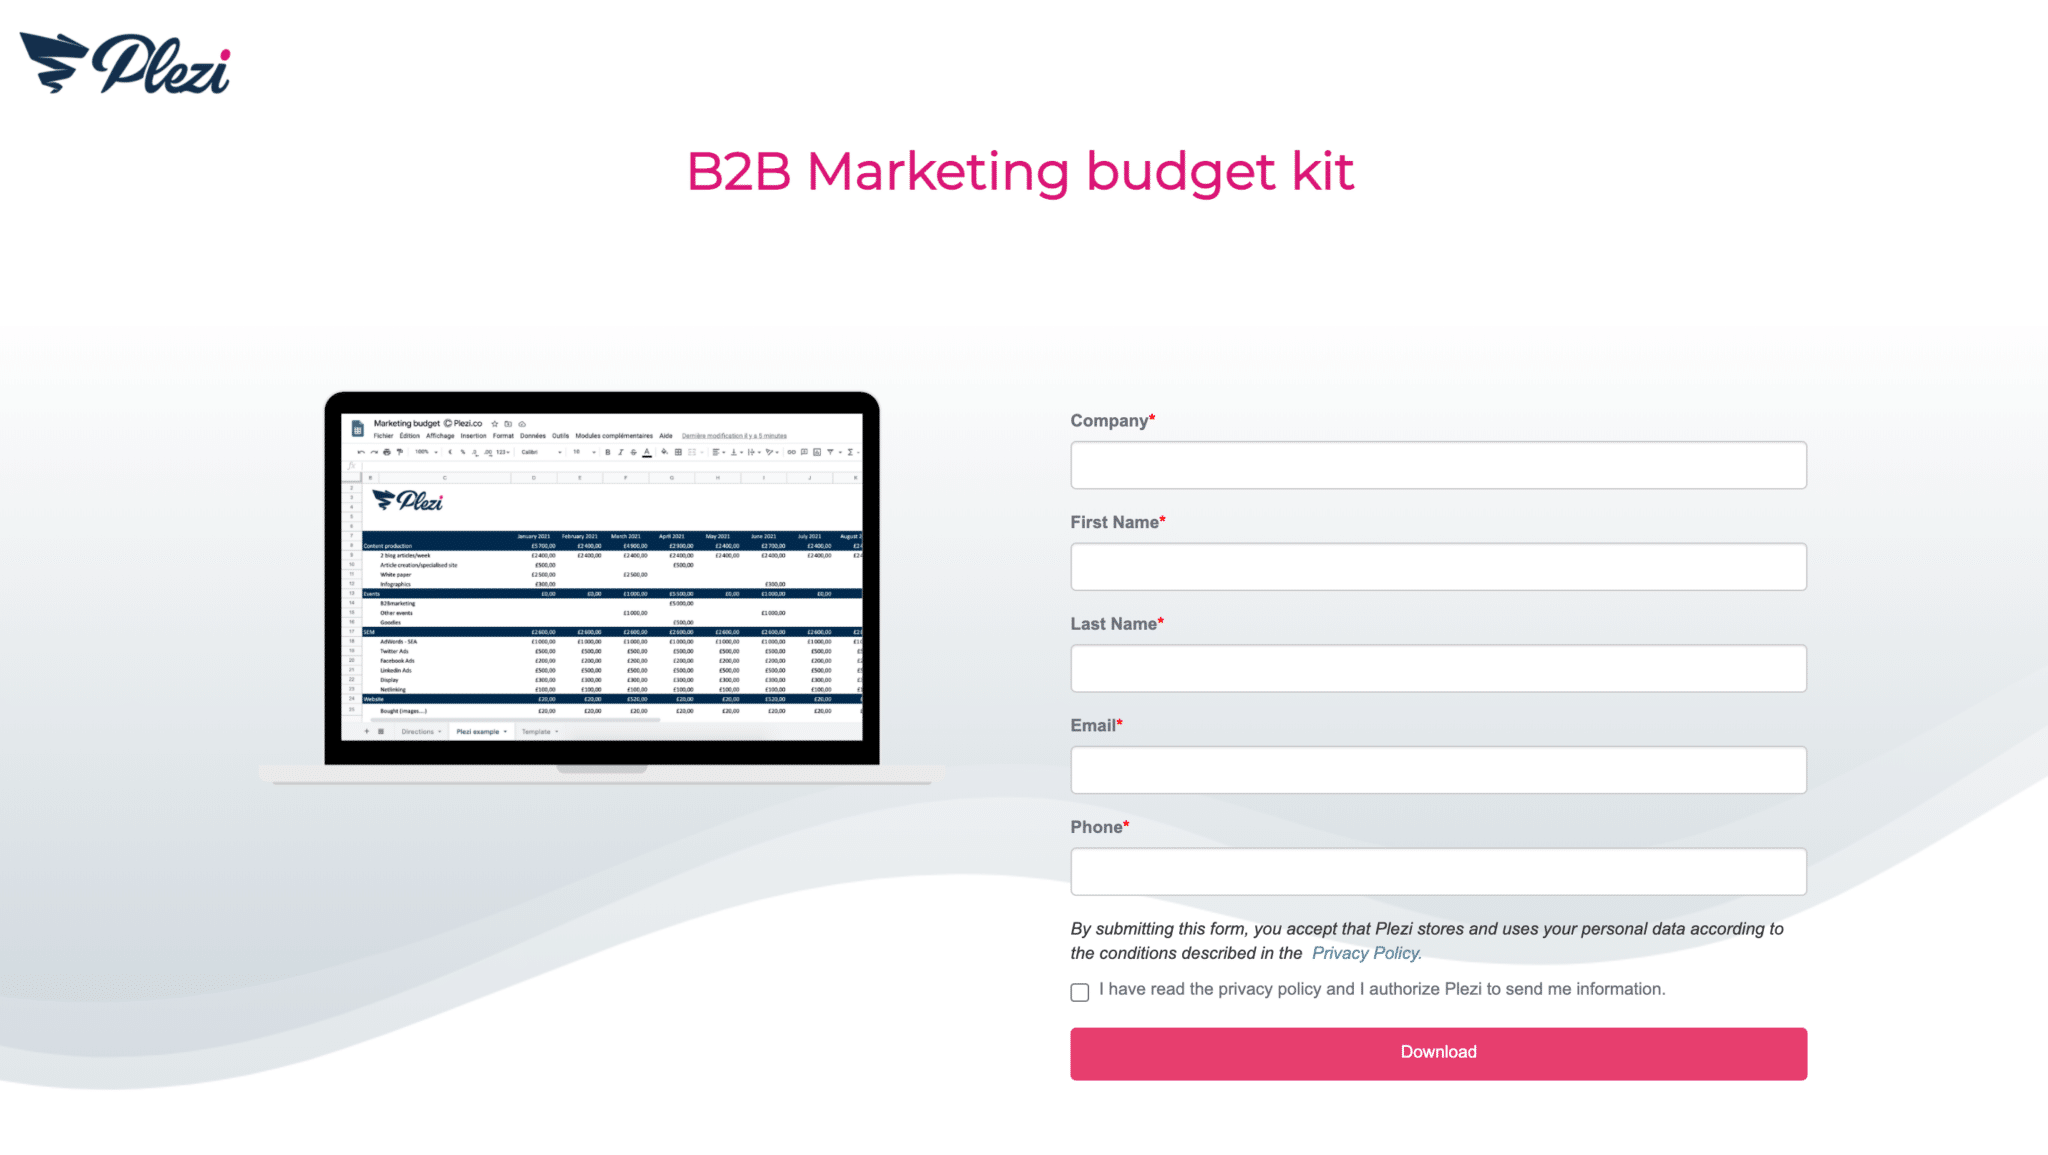 Marketing budget kit